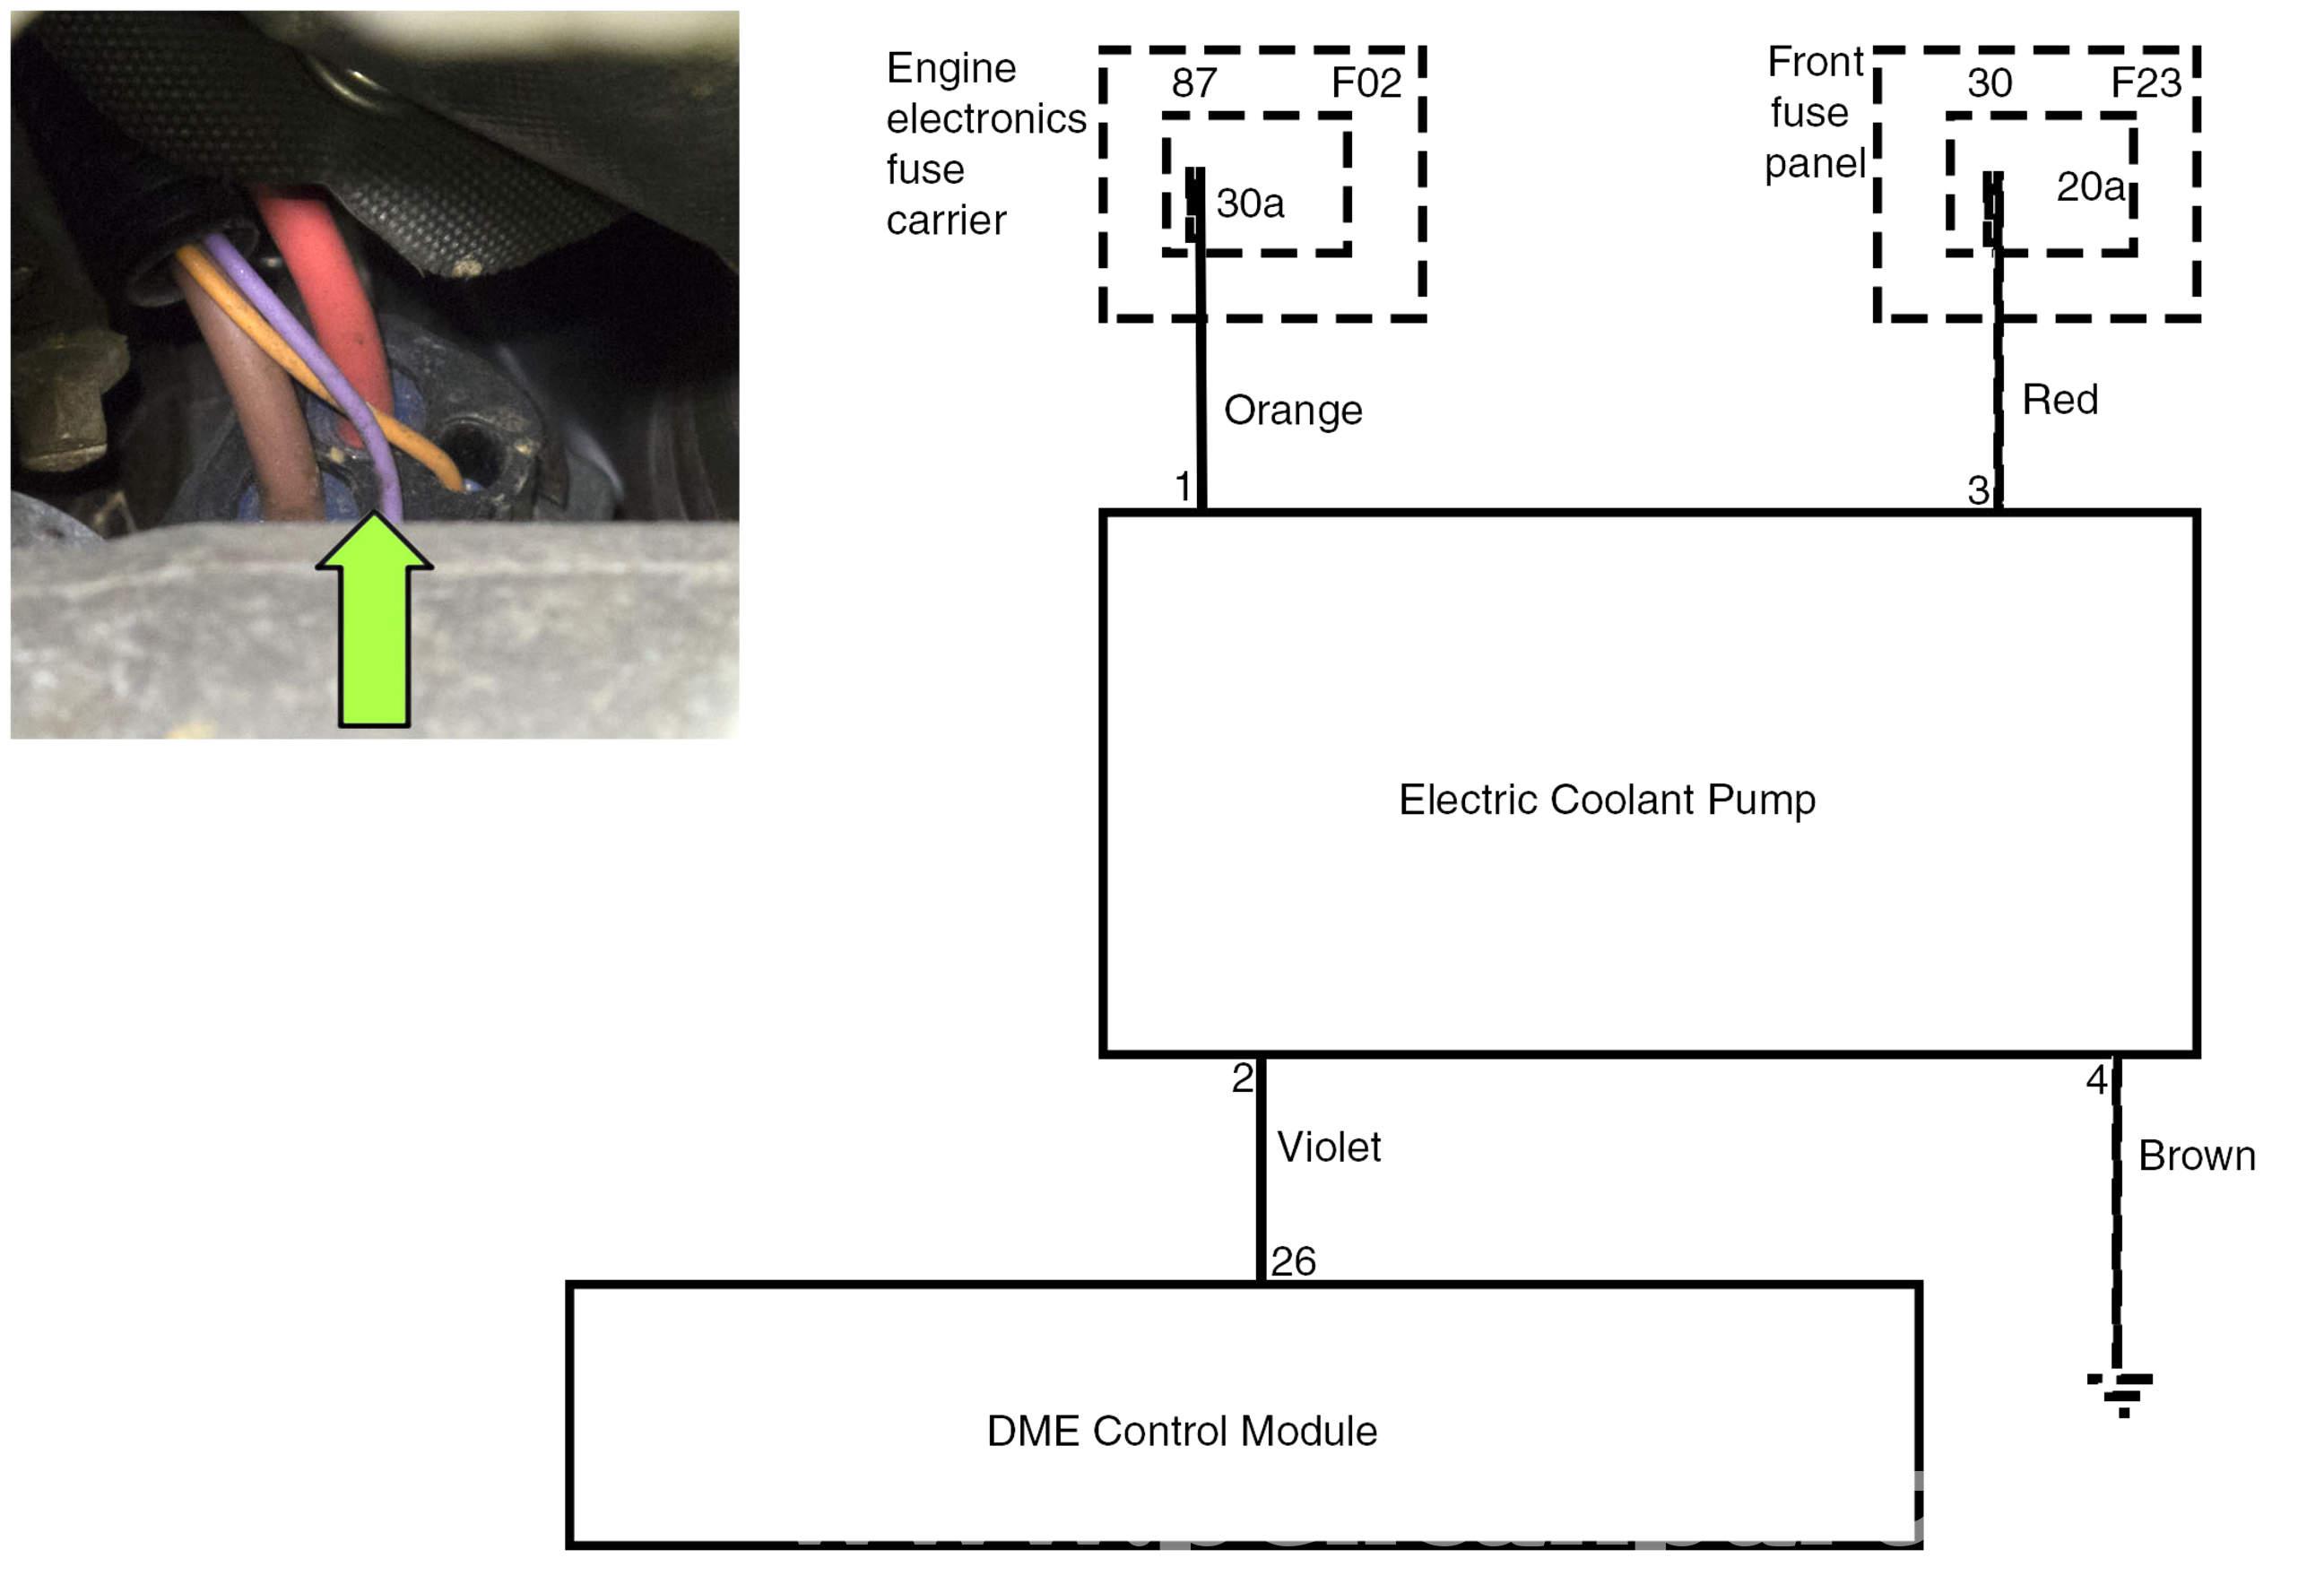 fuel pump wiring diagram e60 diagram base website diagram e60 -  phasediagramwater.magentaproduction.fr  diagram base website full edition - magentaproduction